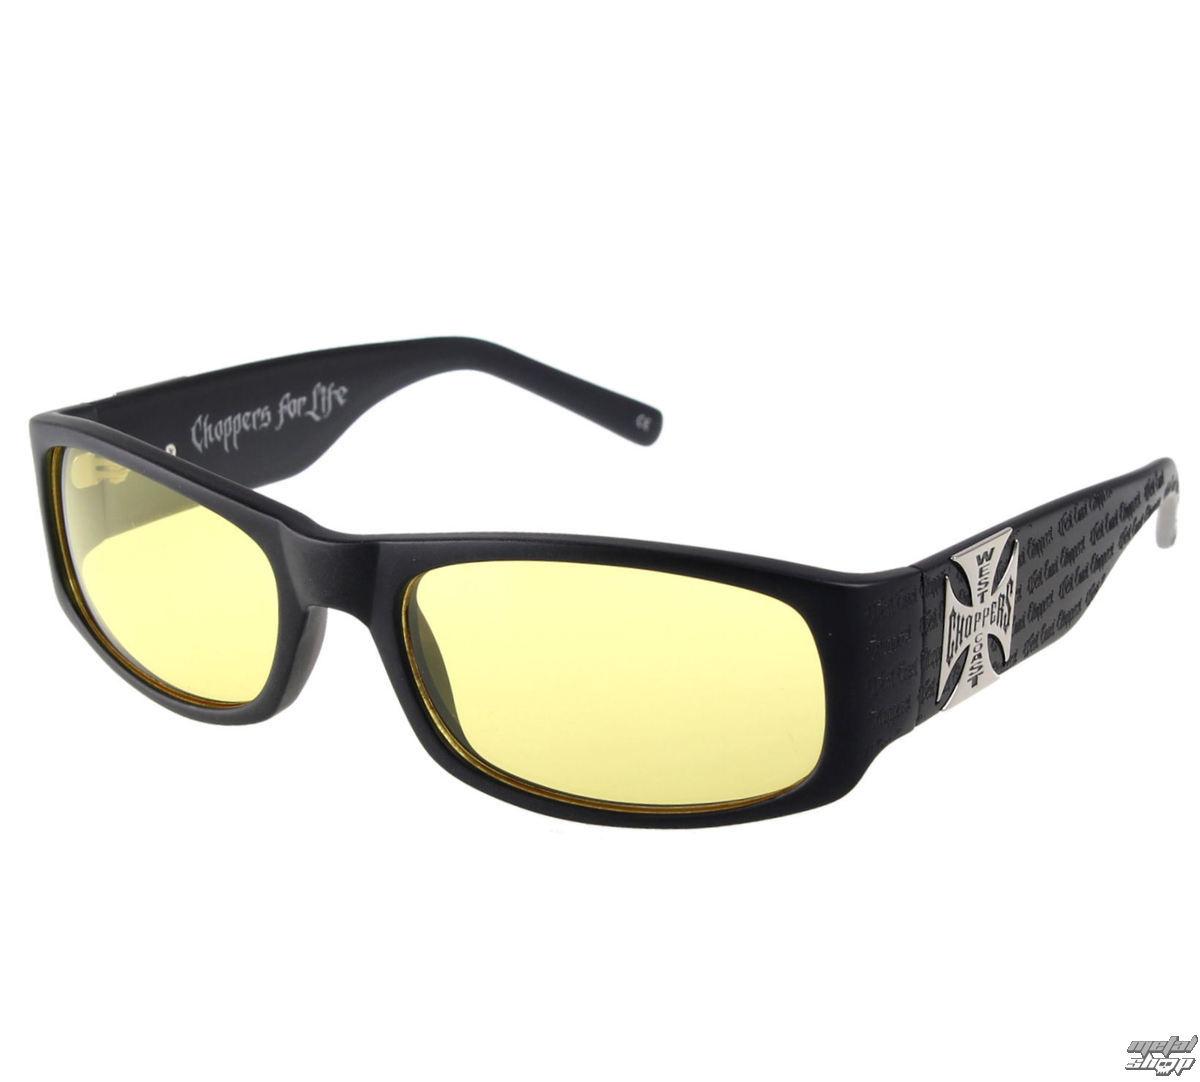 West Coast Choppers szemüveg - WCC GANGSCRIPT - MATTE BLACK YELLOW ... d4298438f3